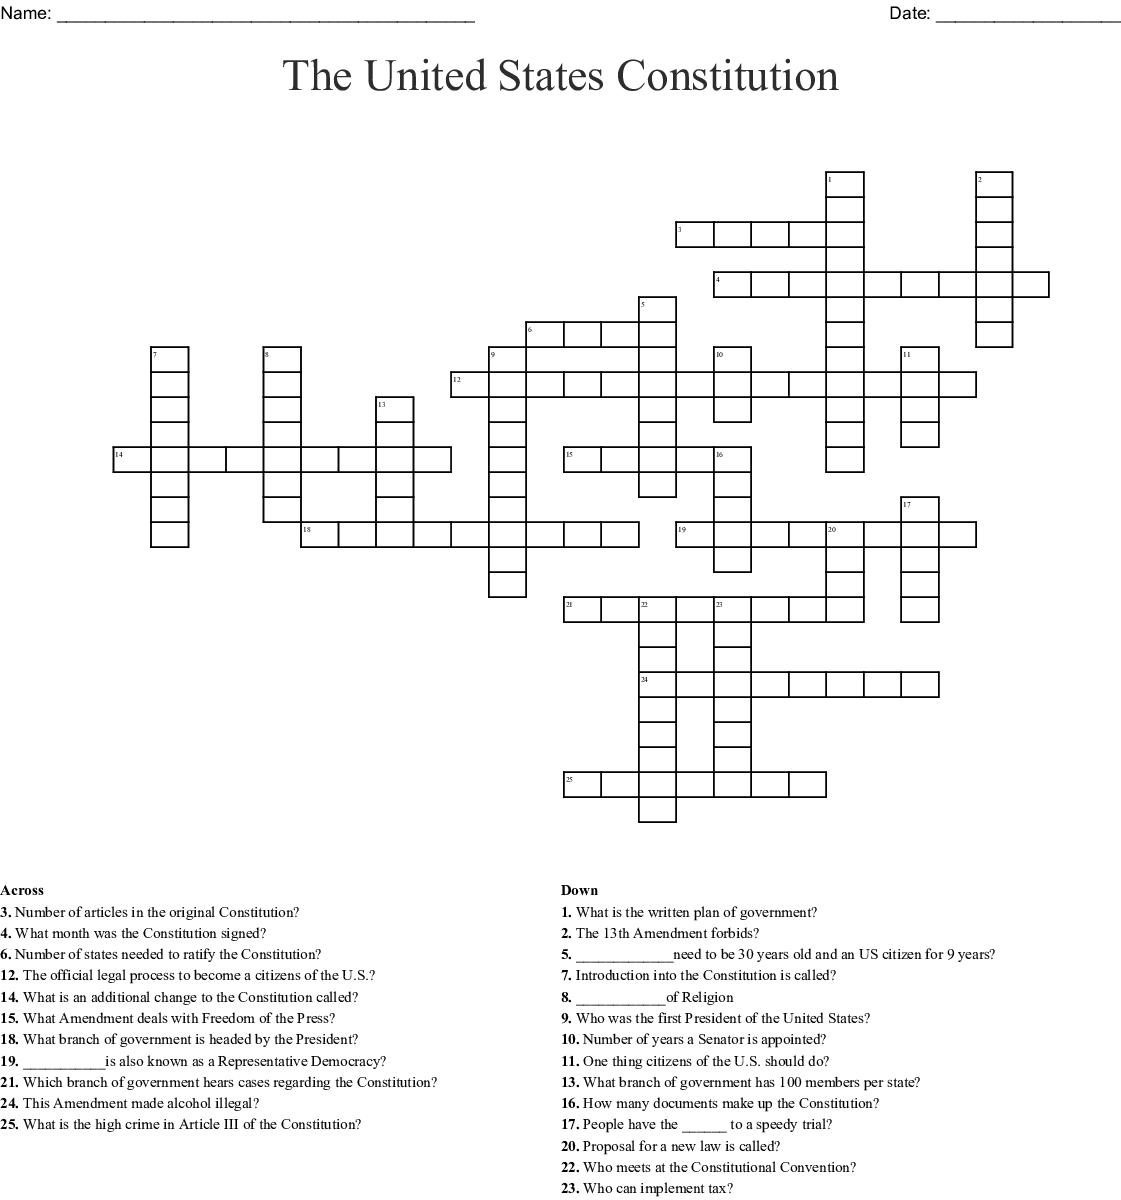 The United States Constitution Crossword